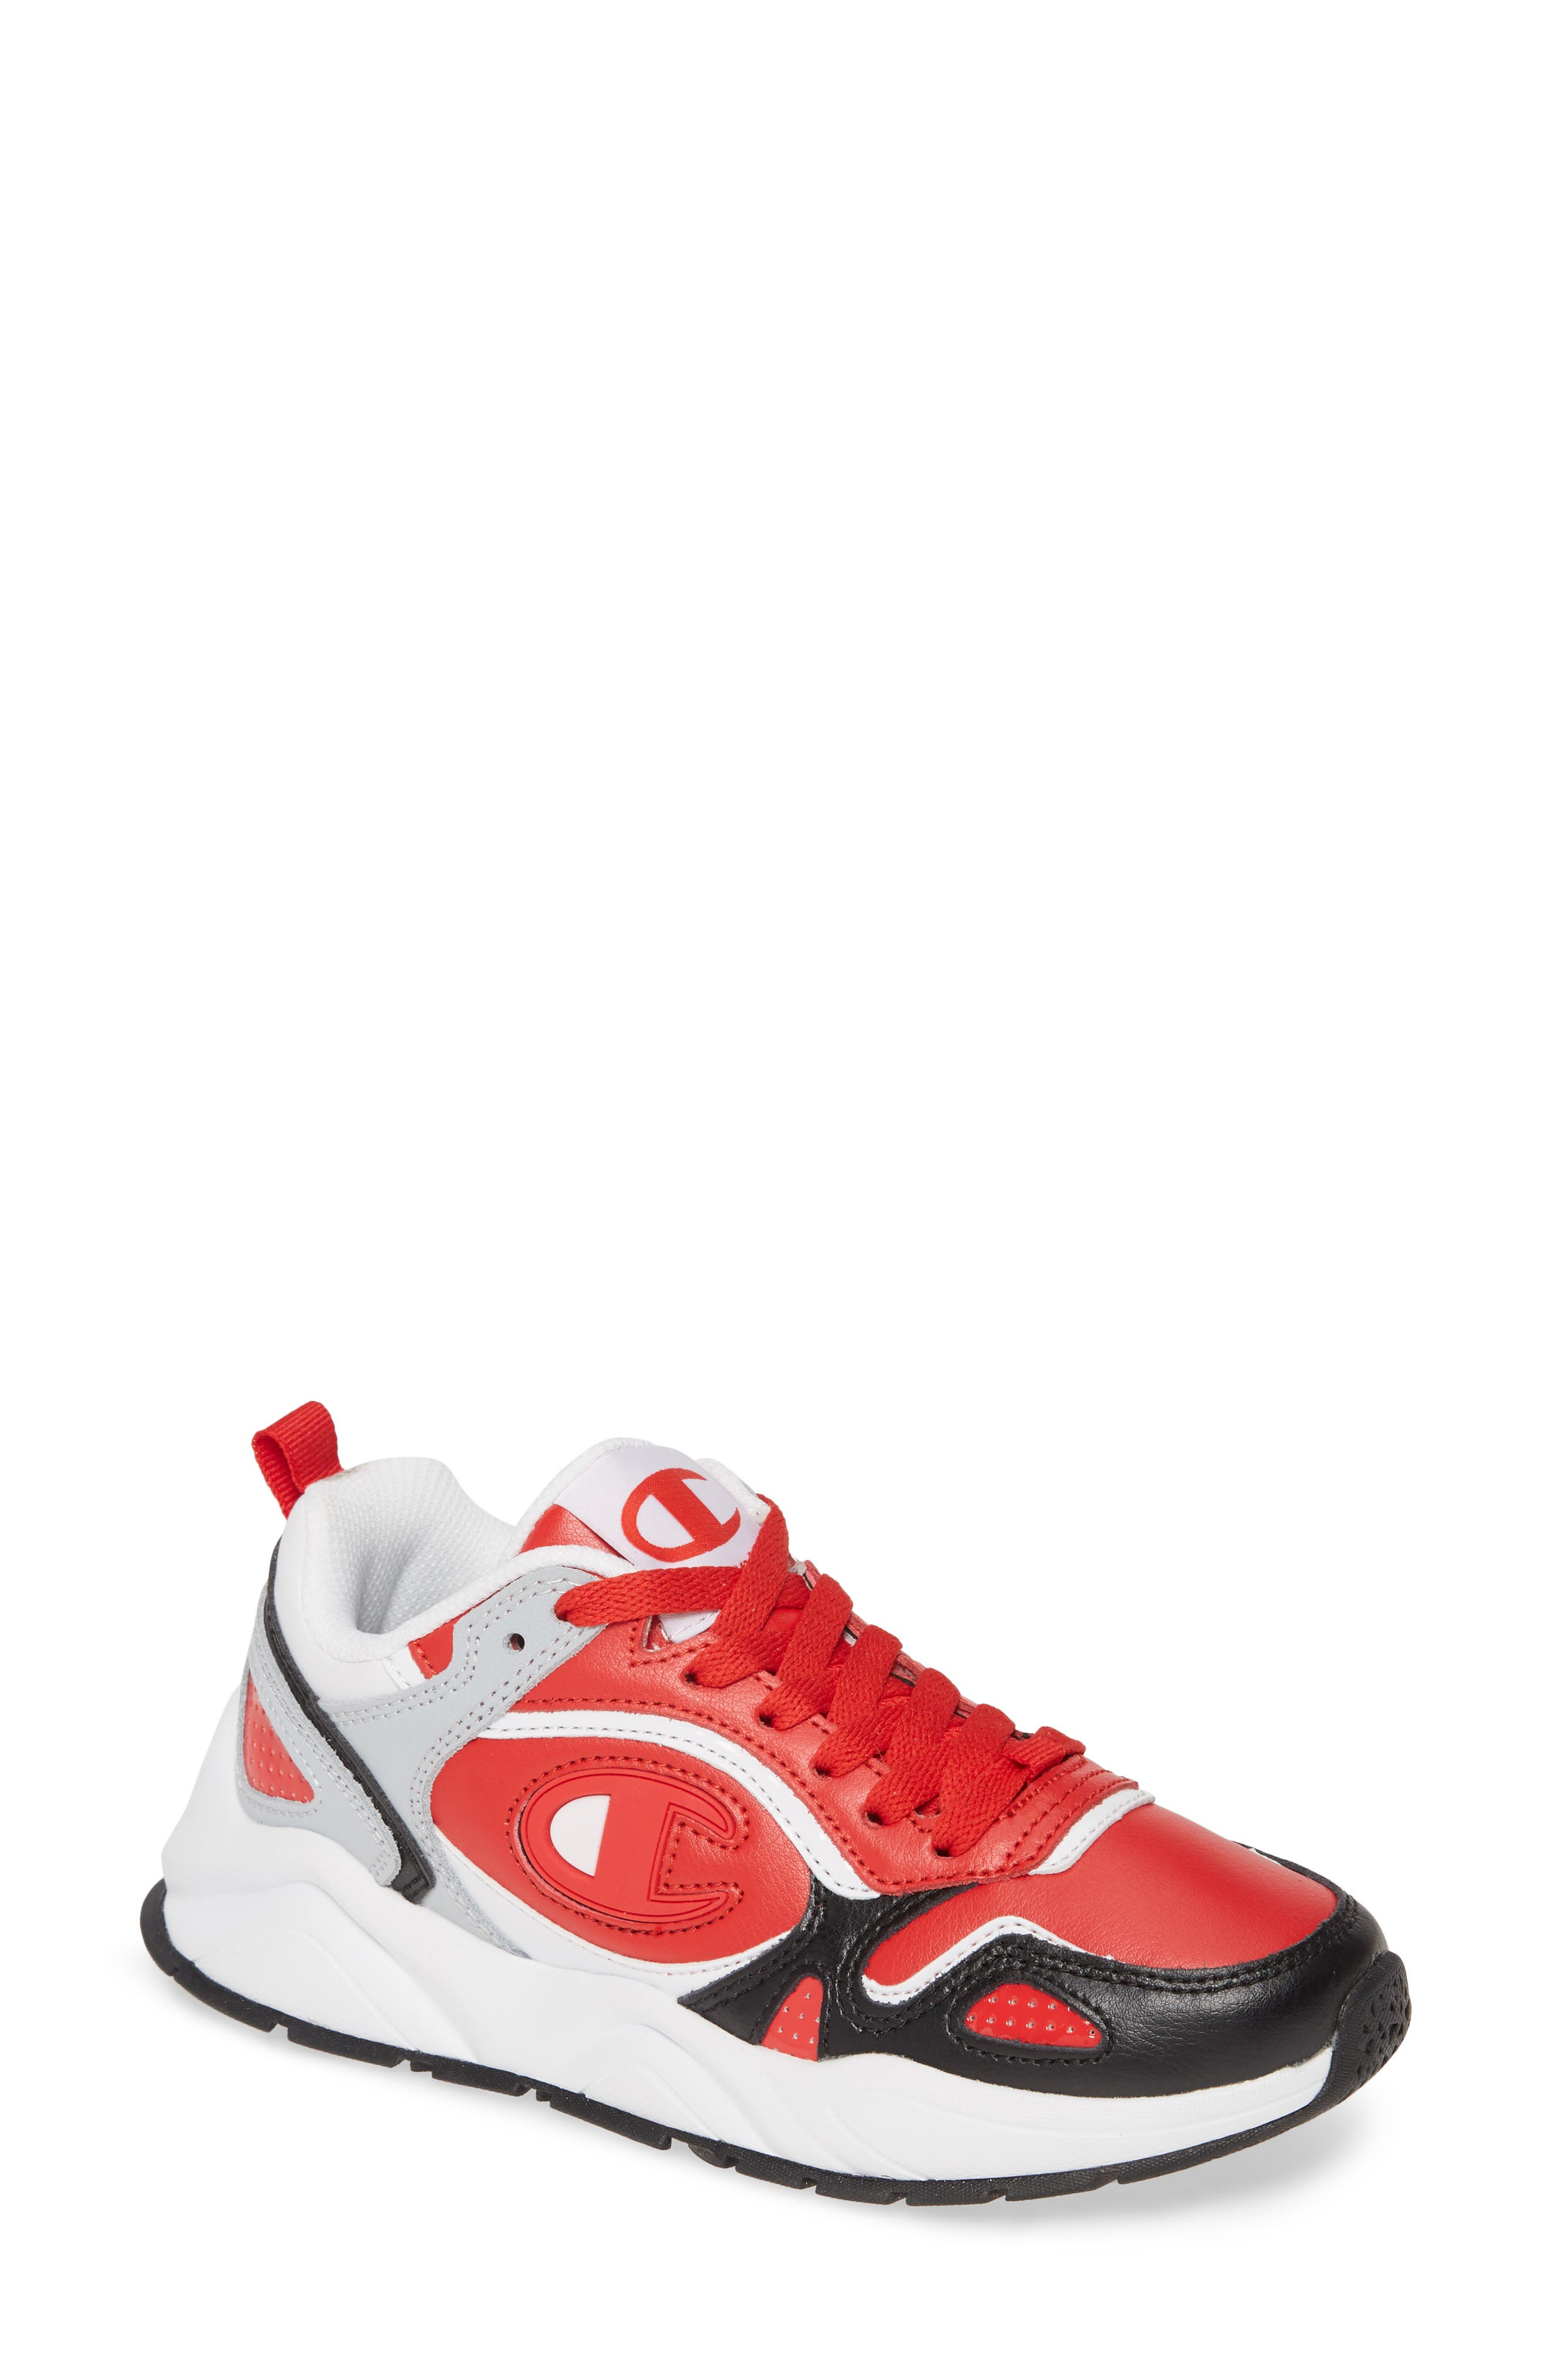 Champion Sneakers NXT Sneaker